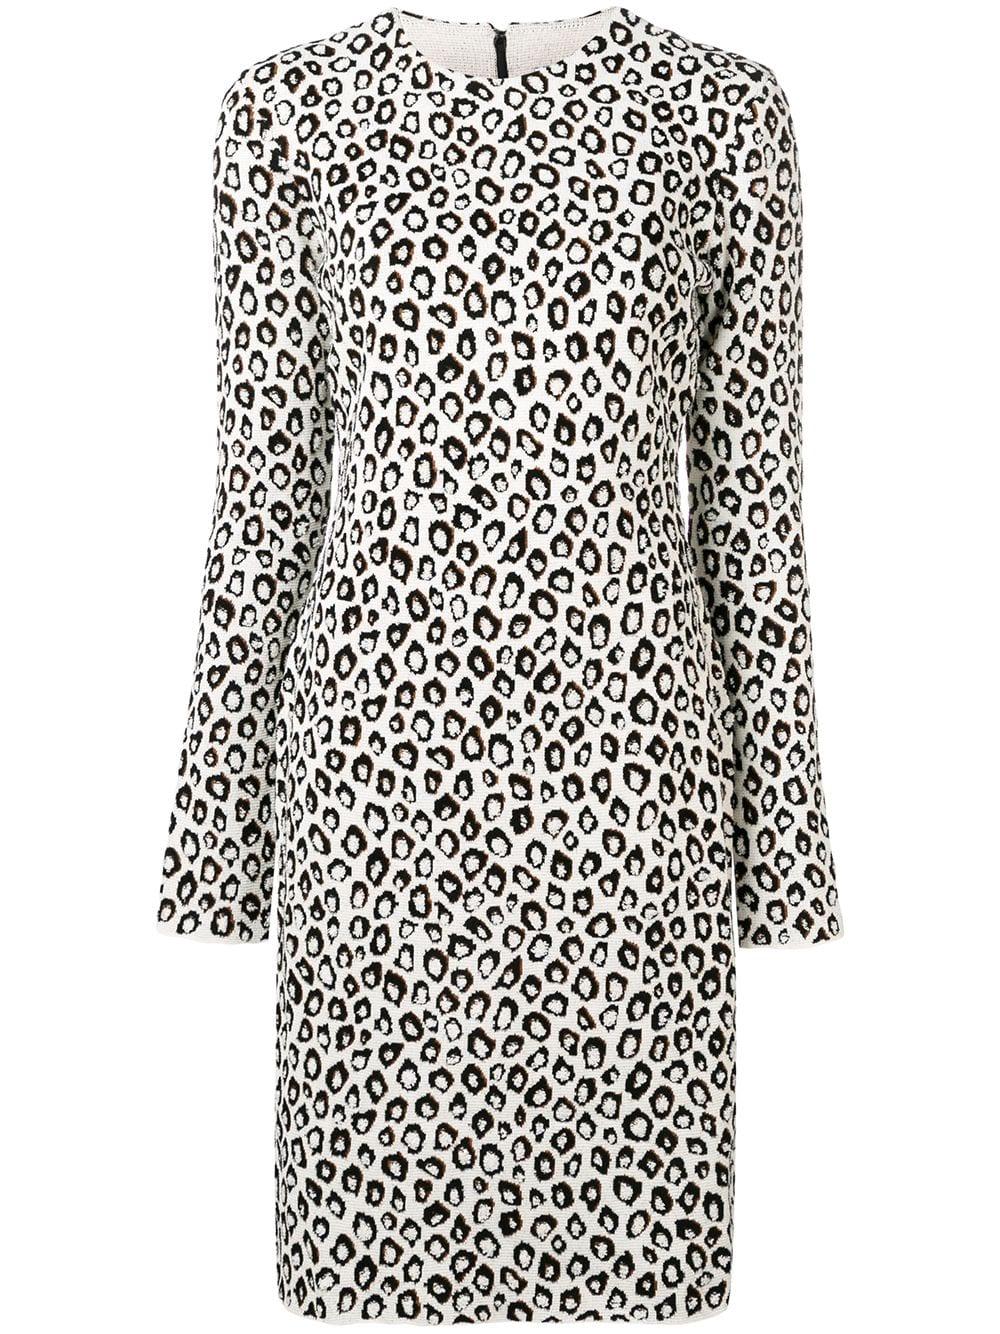 Givenchy Leopard Print Dress Farfetch Leopard Print Dress Print Dress Leopard Print [ 1334 x 1000 Pixel ]